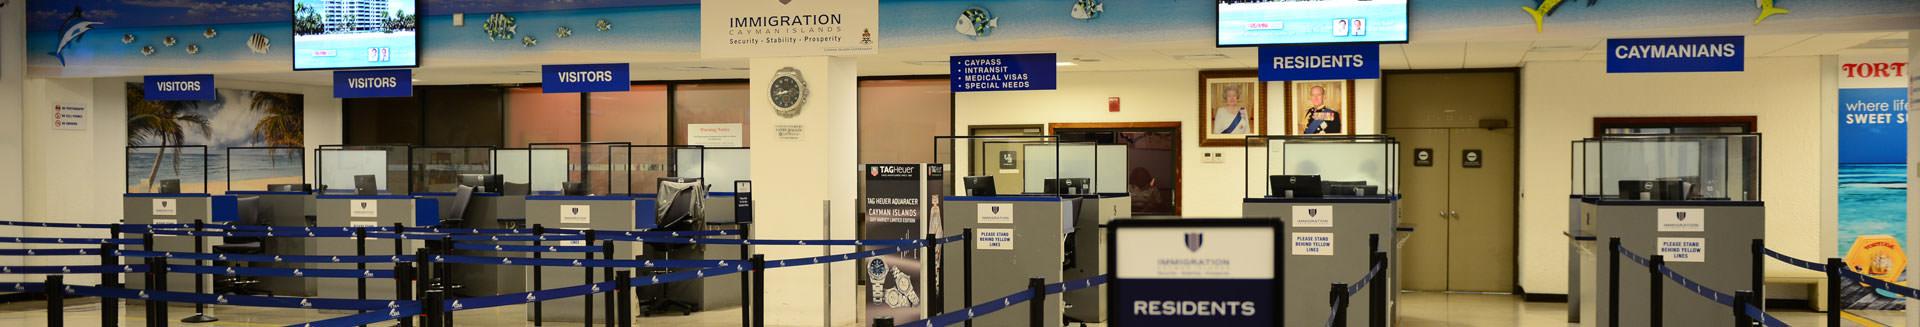 Border Control & Tourism Authorities